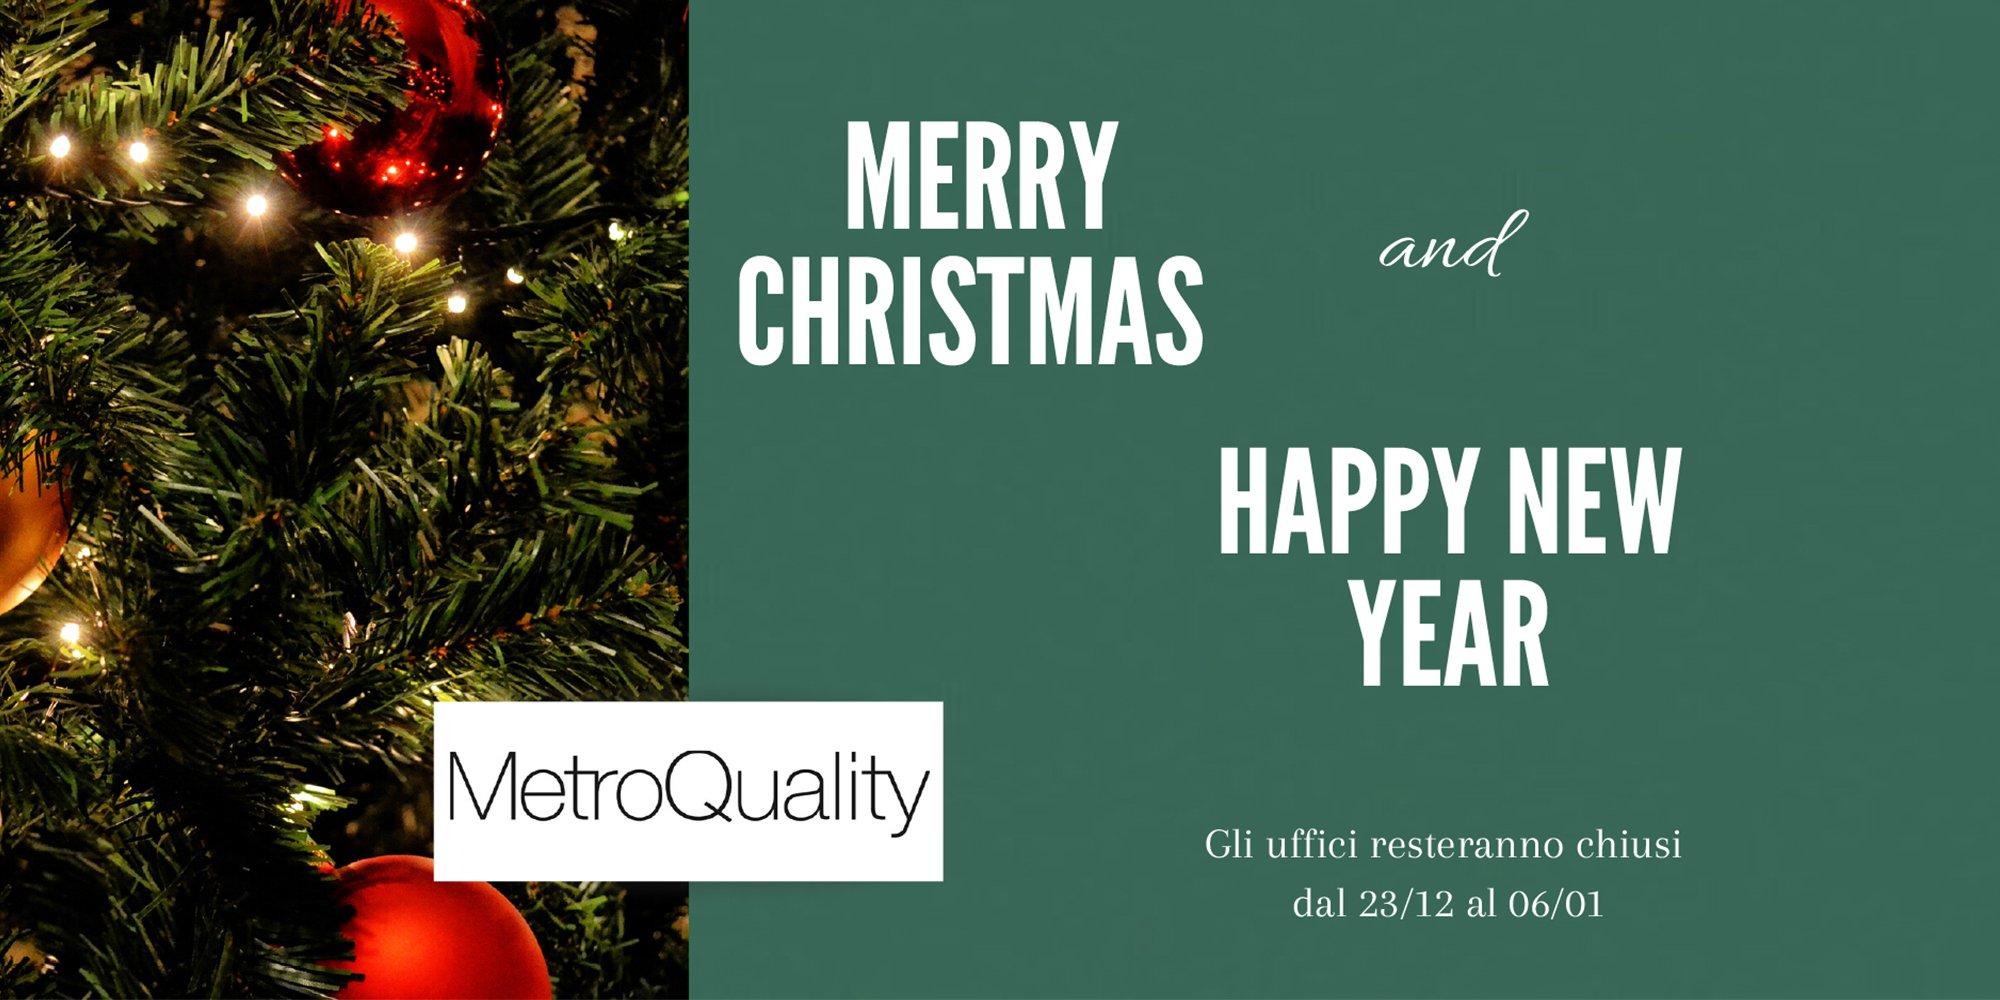 MetroQuality-merry-christmas-news